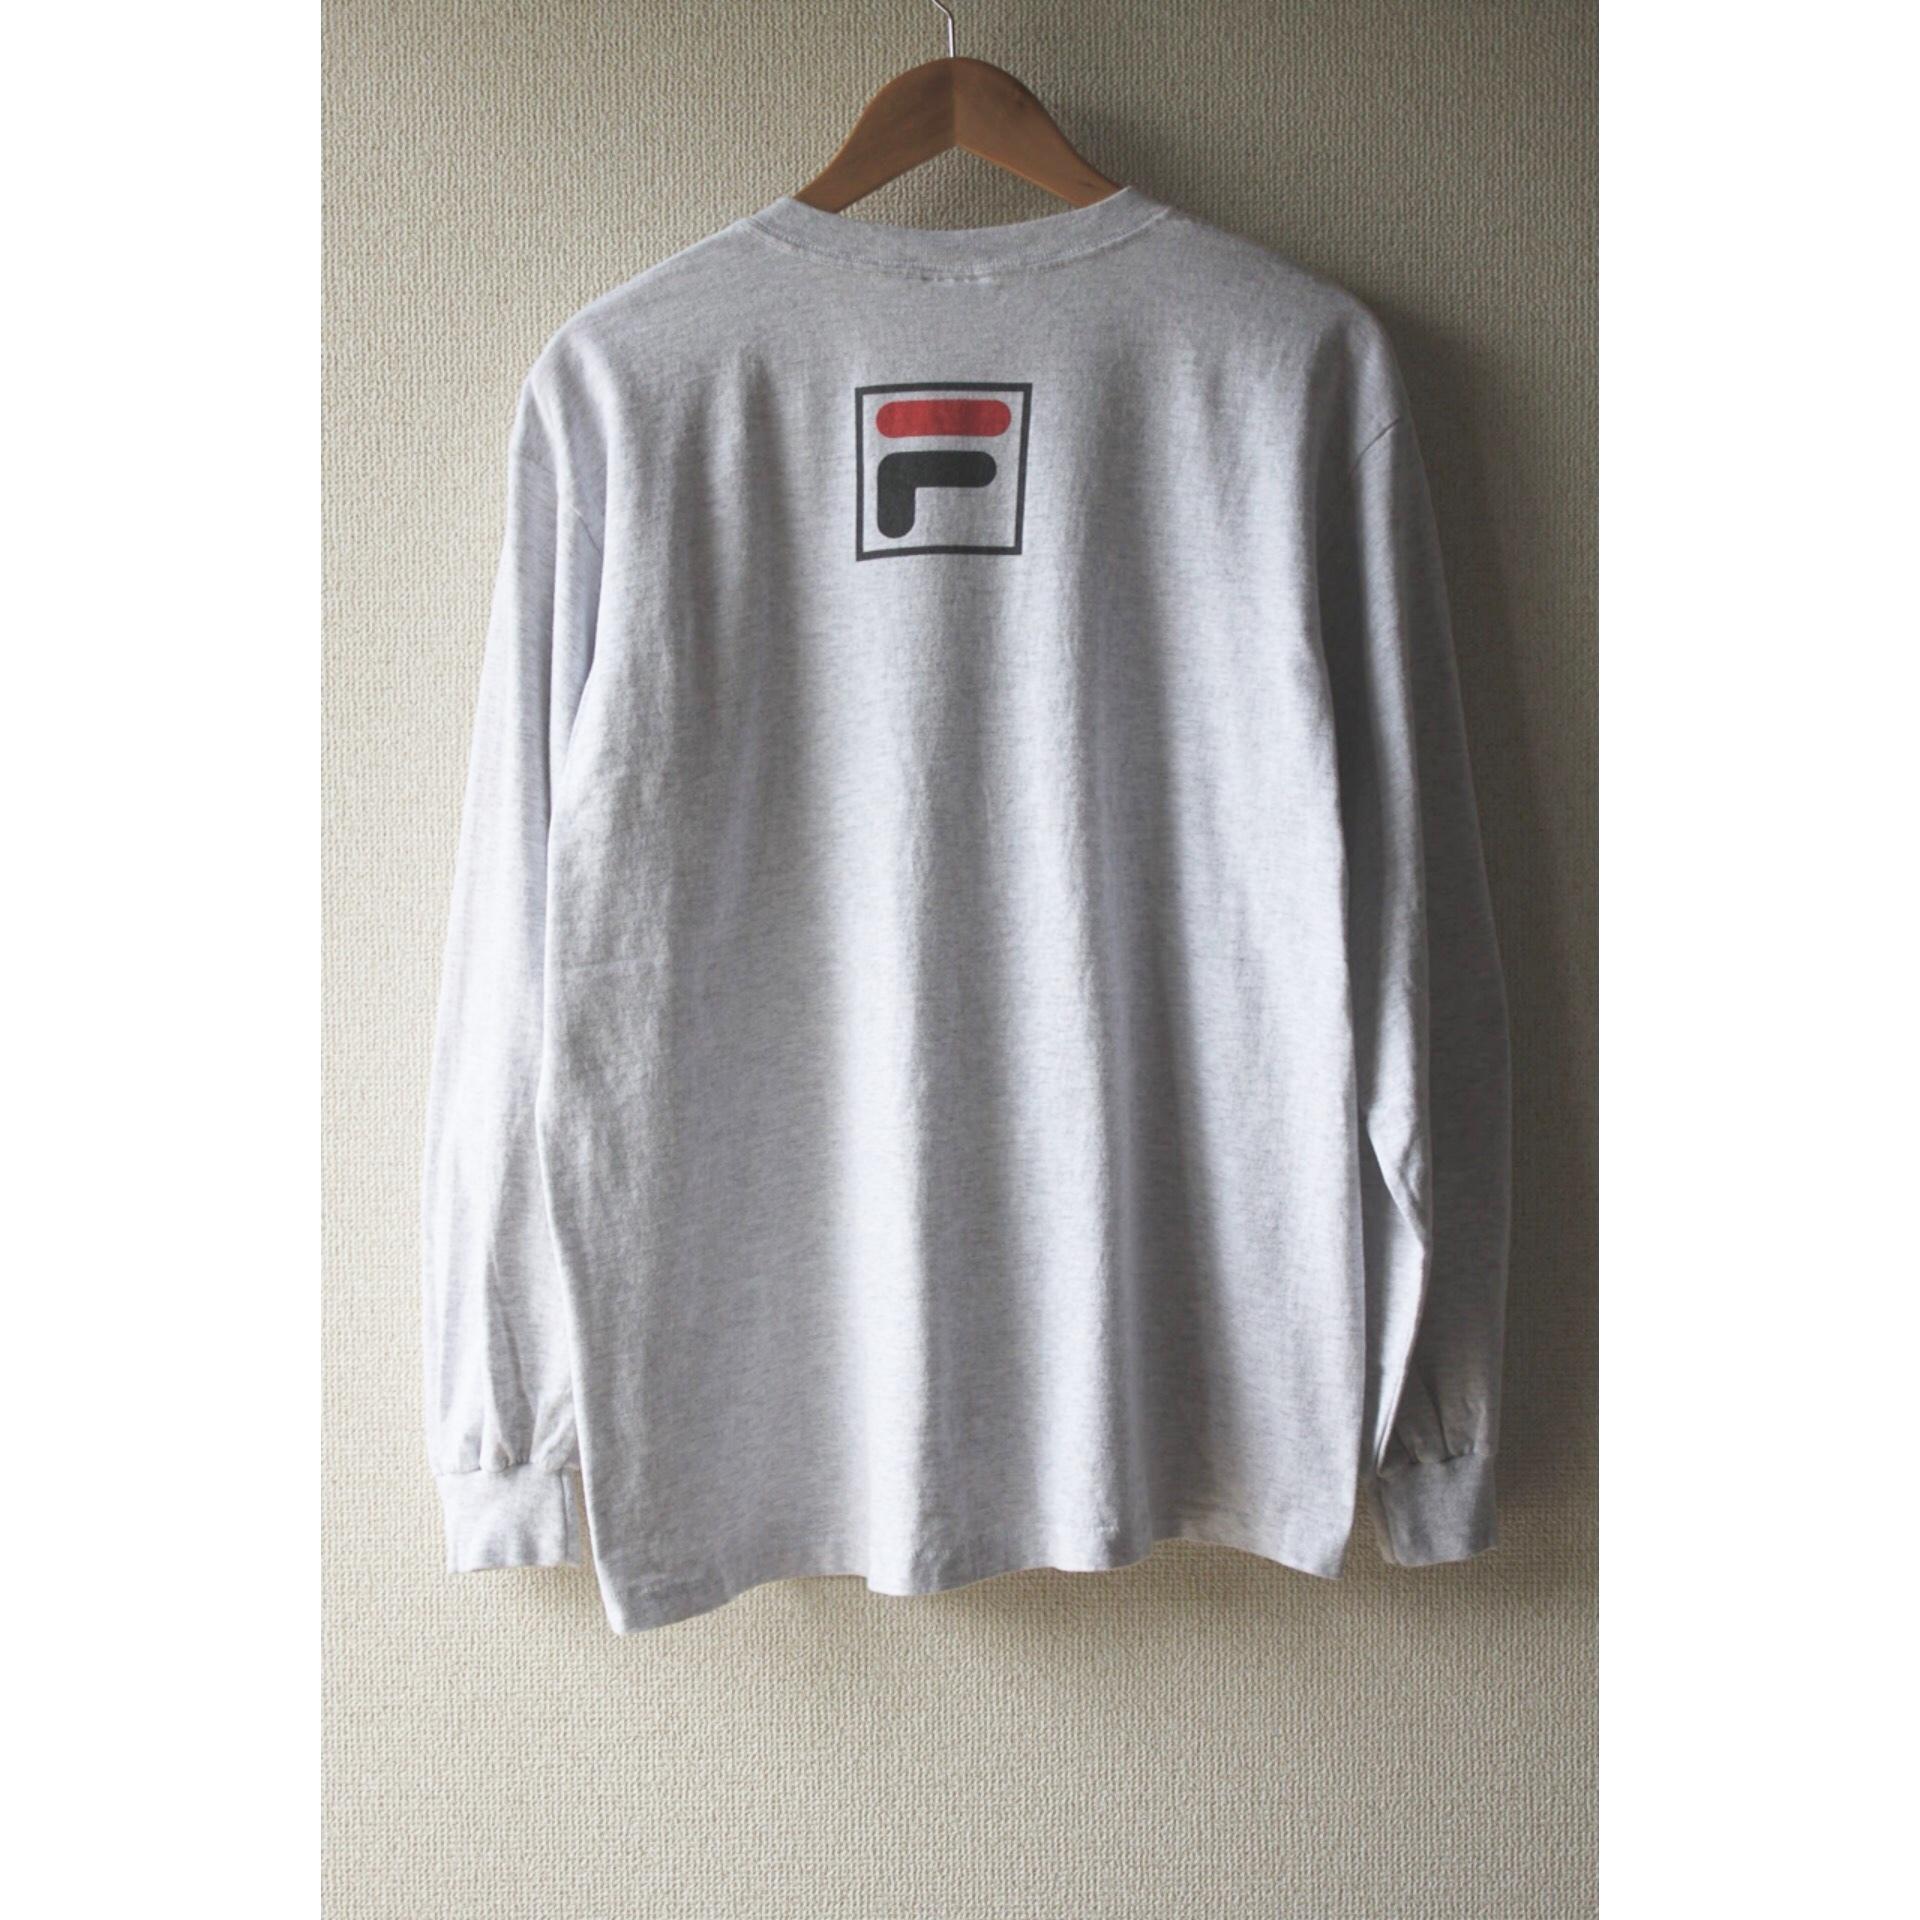 90s FILA long sleeve shirt